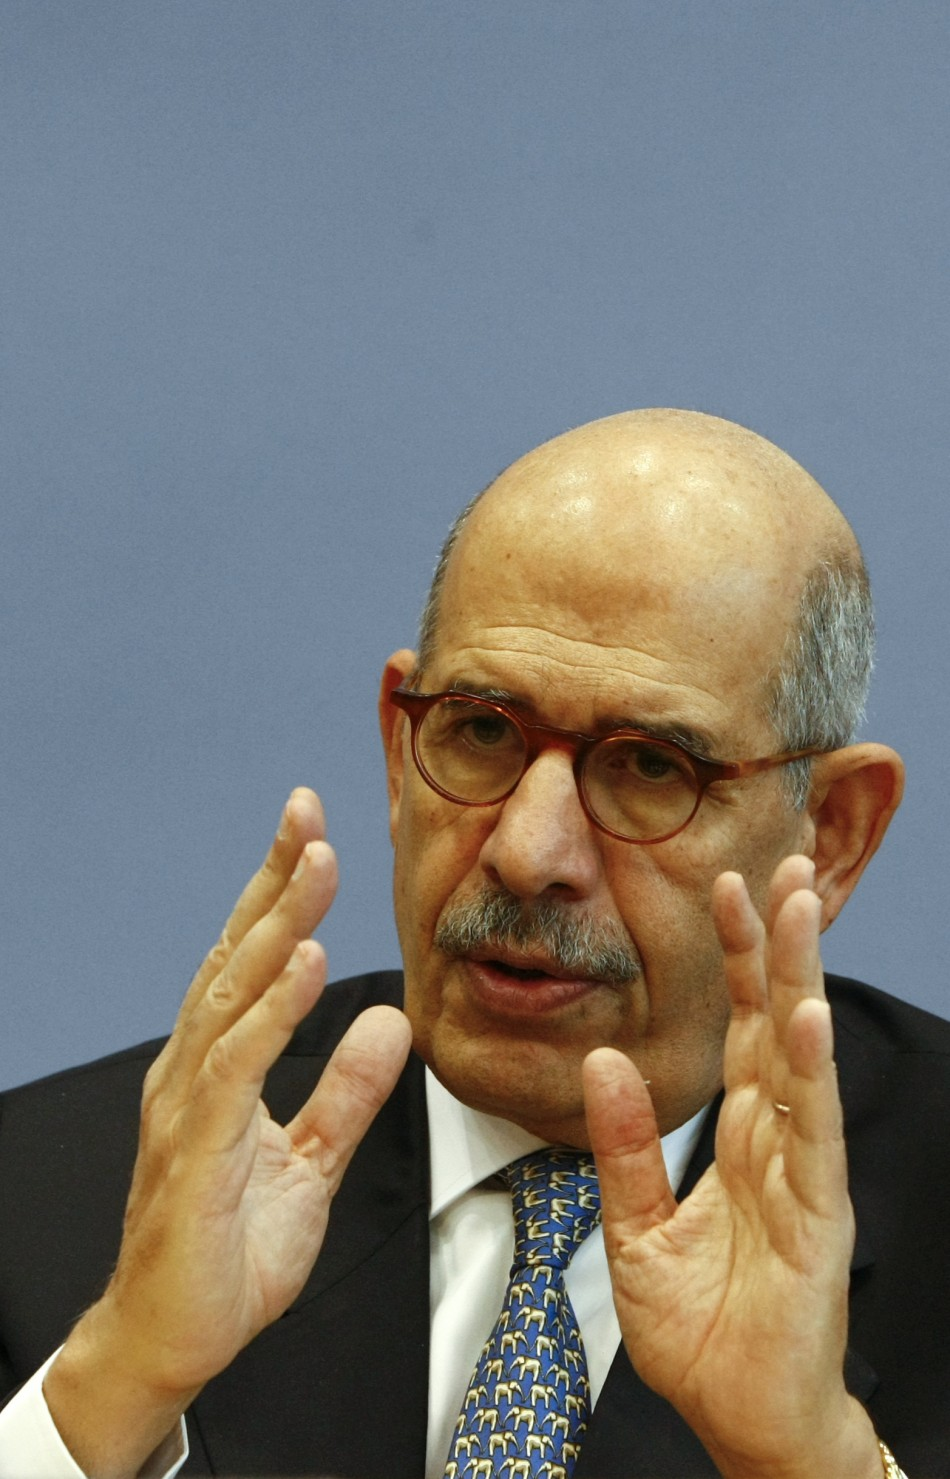 Former International Atomic Energy Agency Director General El Baradei addresses a news conference in Berlin